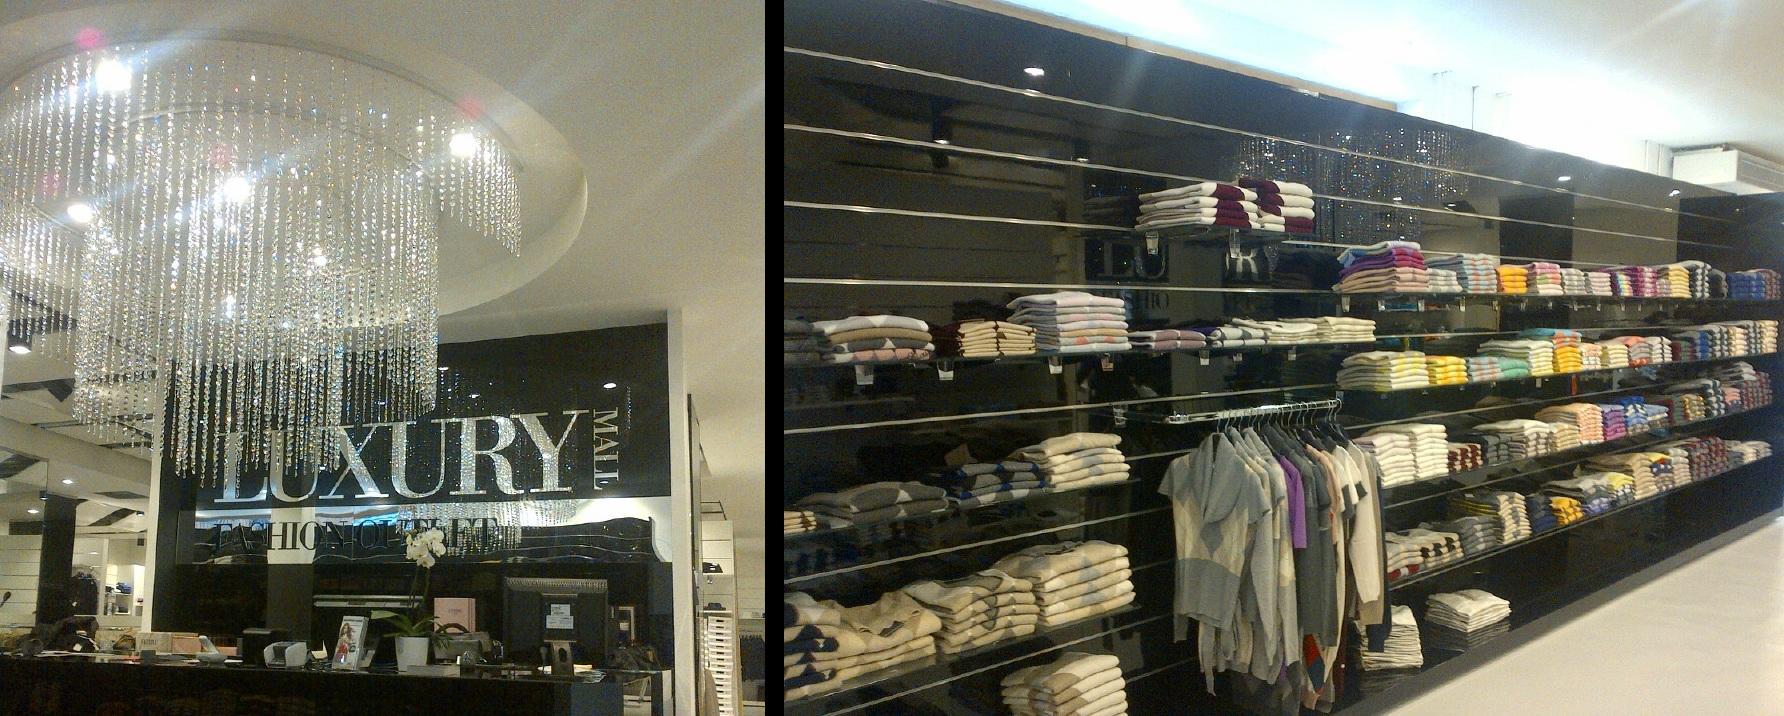 Luxury Mall Landquart c/o Designer Outlet